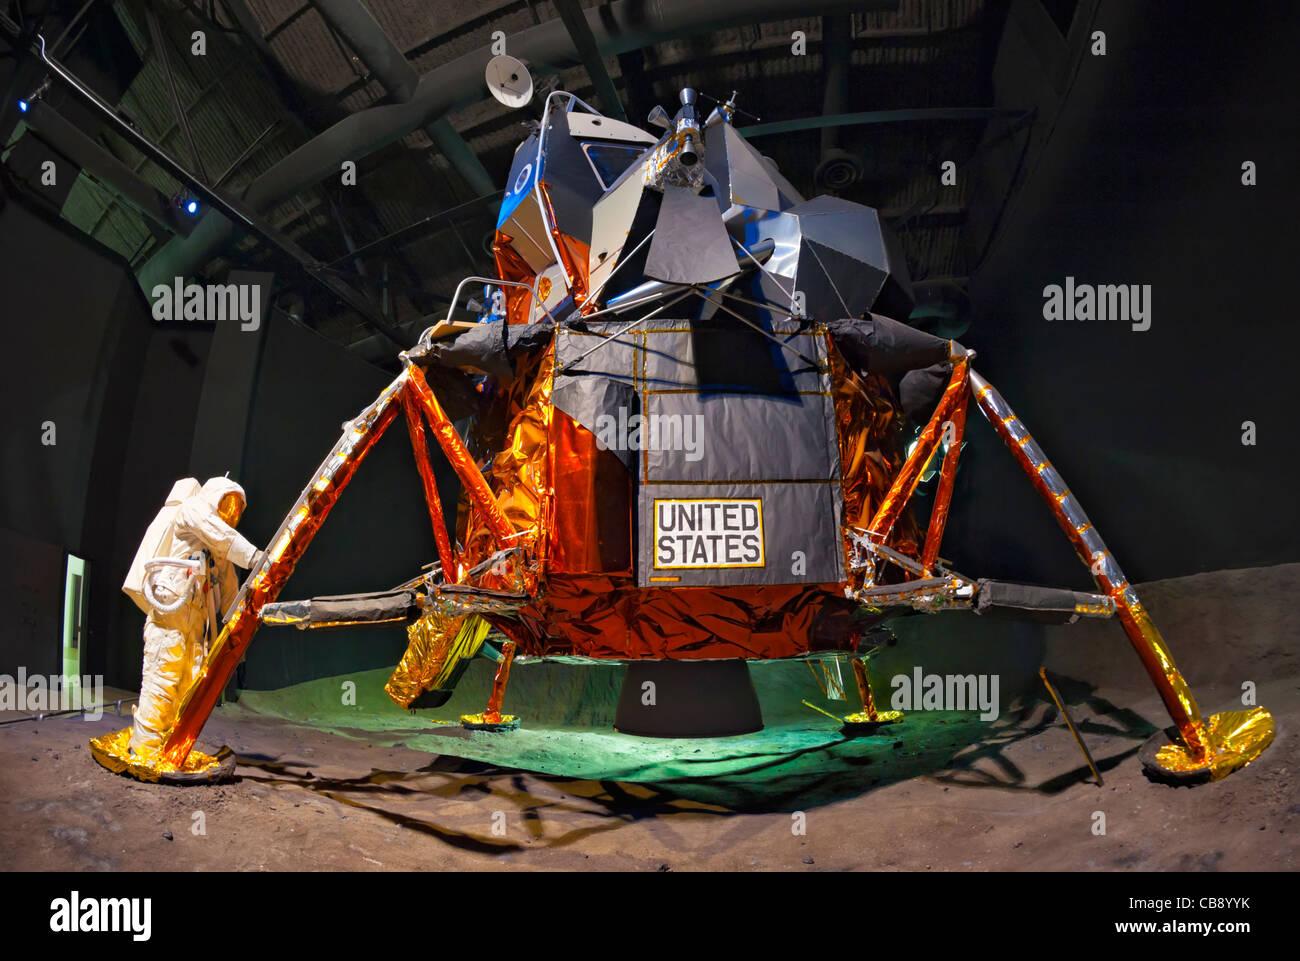 Lunar Module LM-13 (Apollo 18 mission), NASA astronaut spacesuit, Cradle of Aviation Museum exhibit, New York, USA, - Stock Image